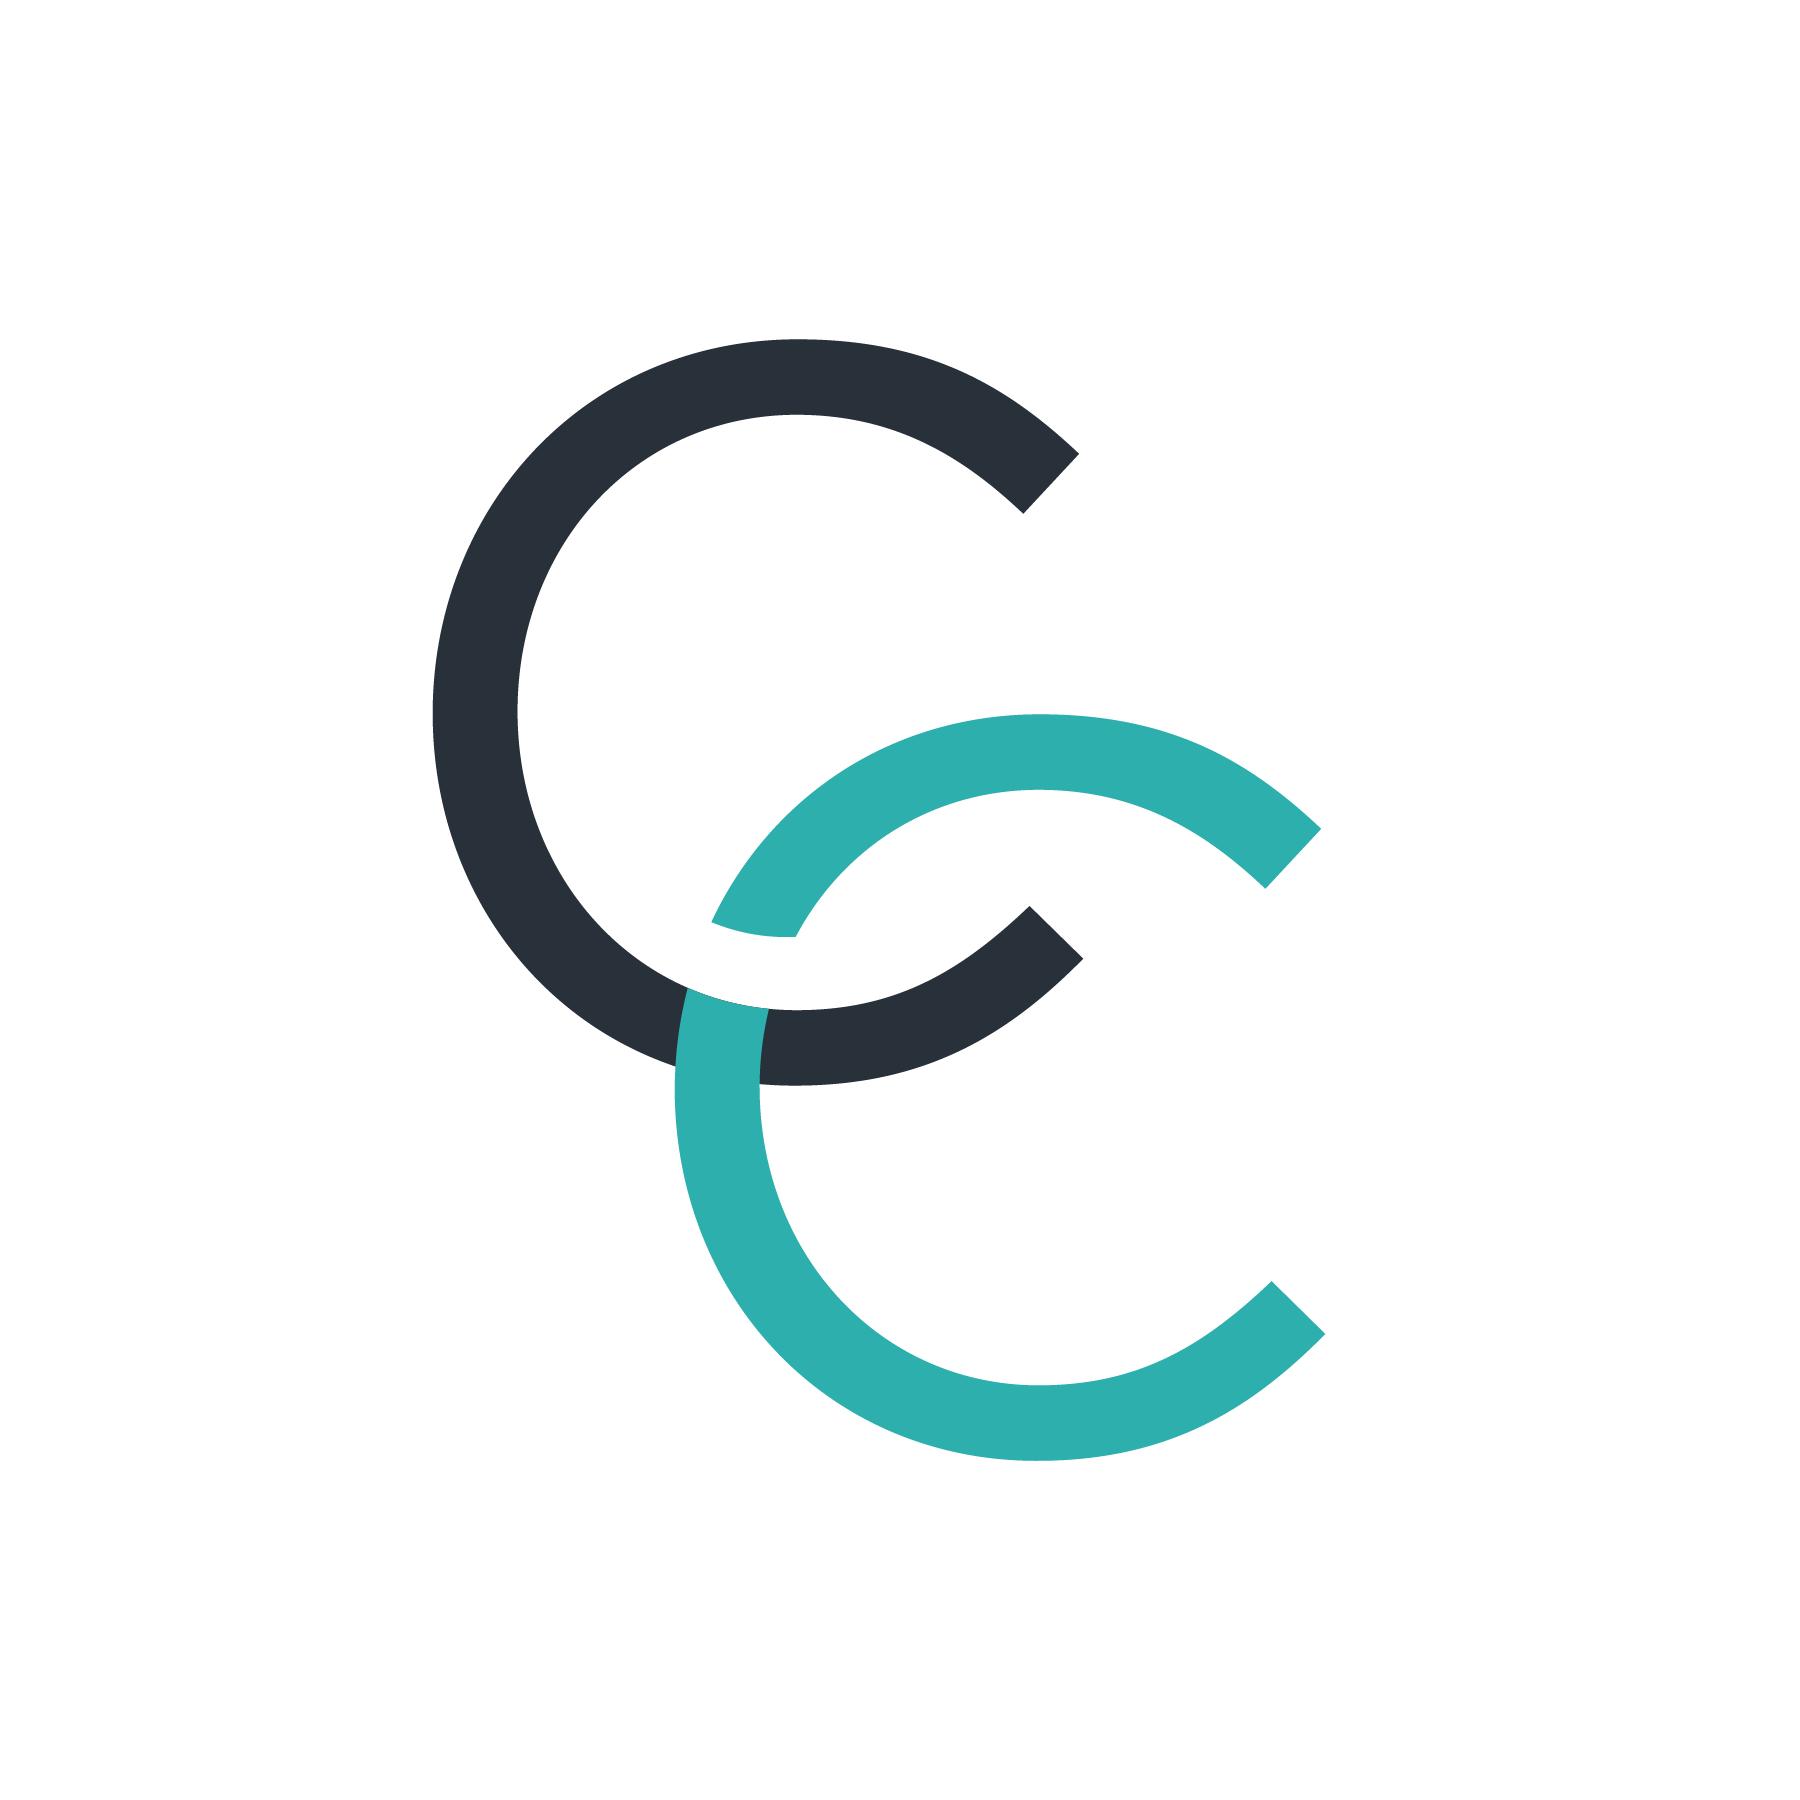 CC-brandmark-white.png